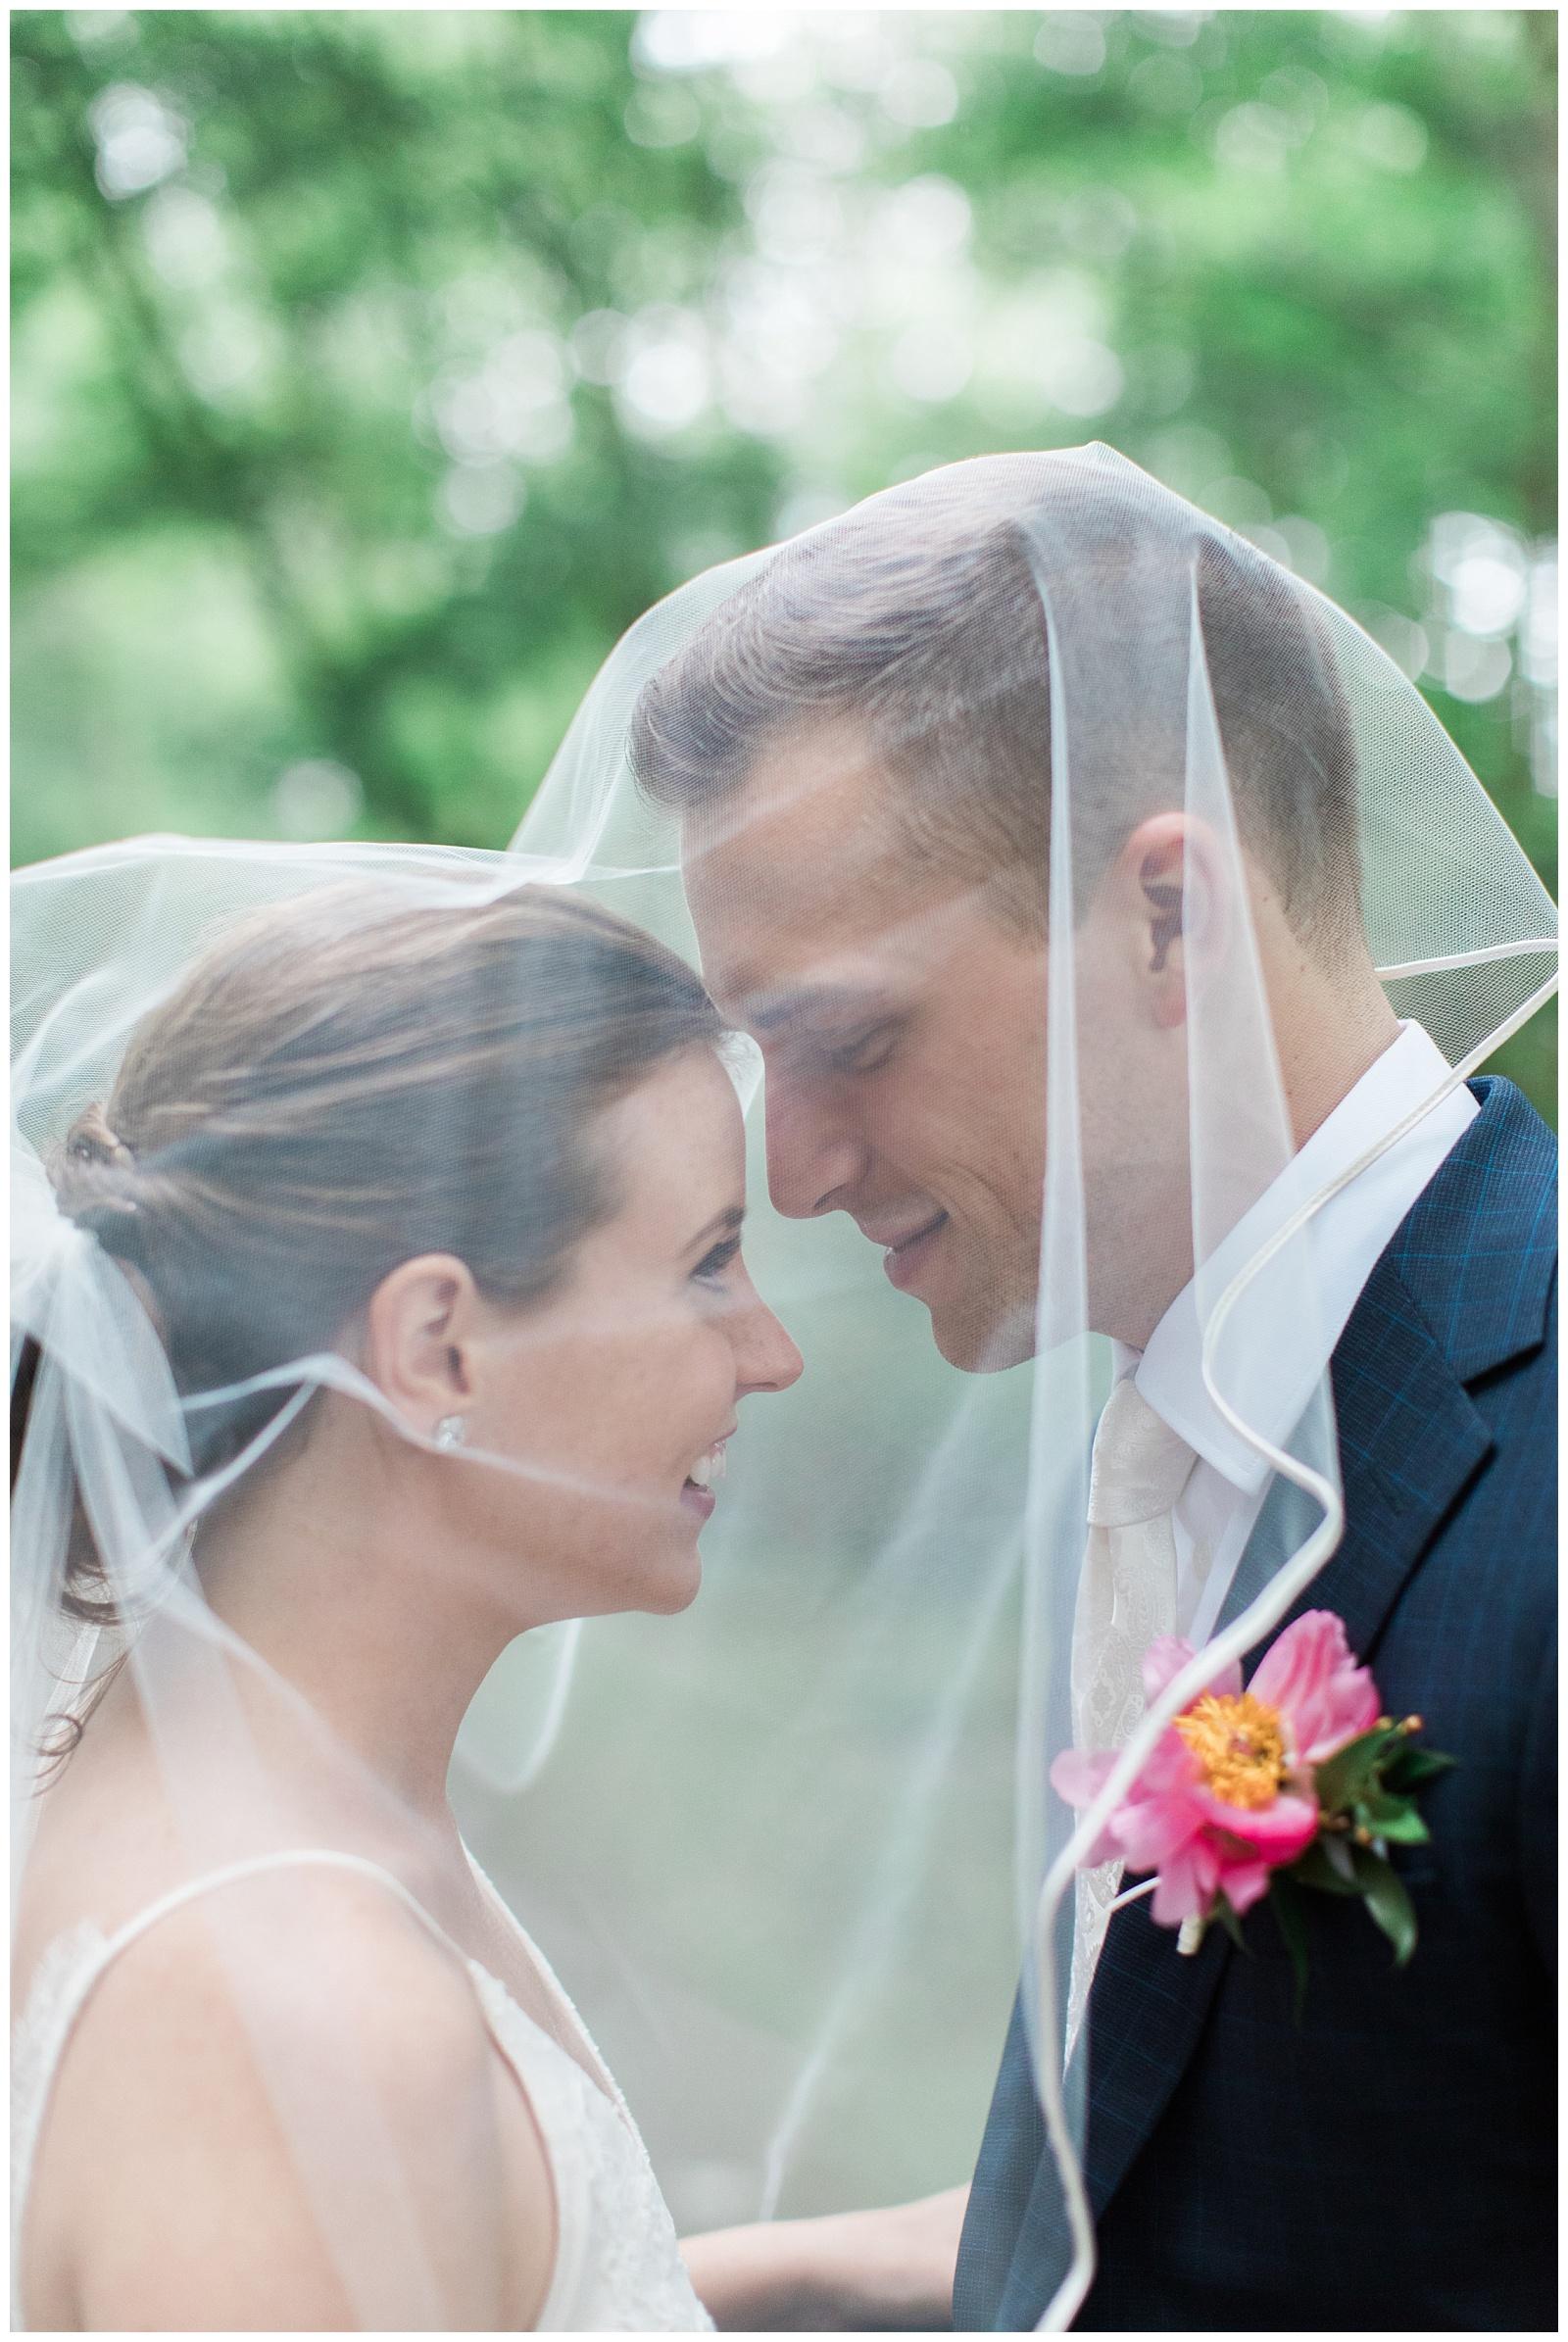 Bride and groom under veil at Guelph Ontario Wedding | Ontario Wedding Photographer | Toronto Wedding Photographer | 3photography